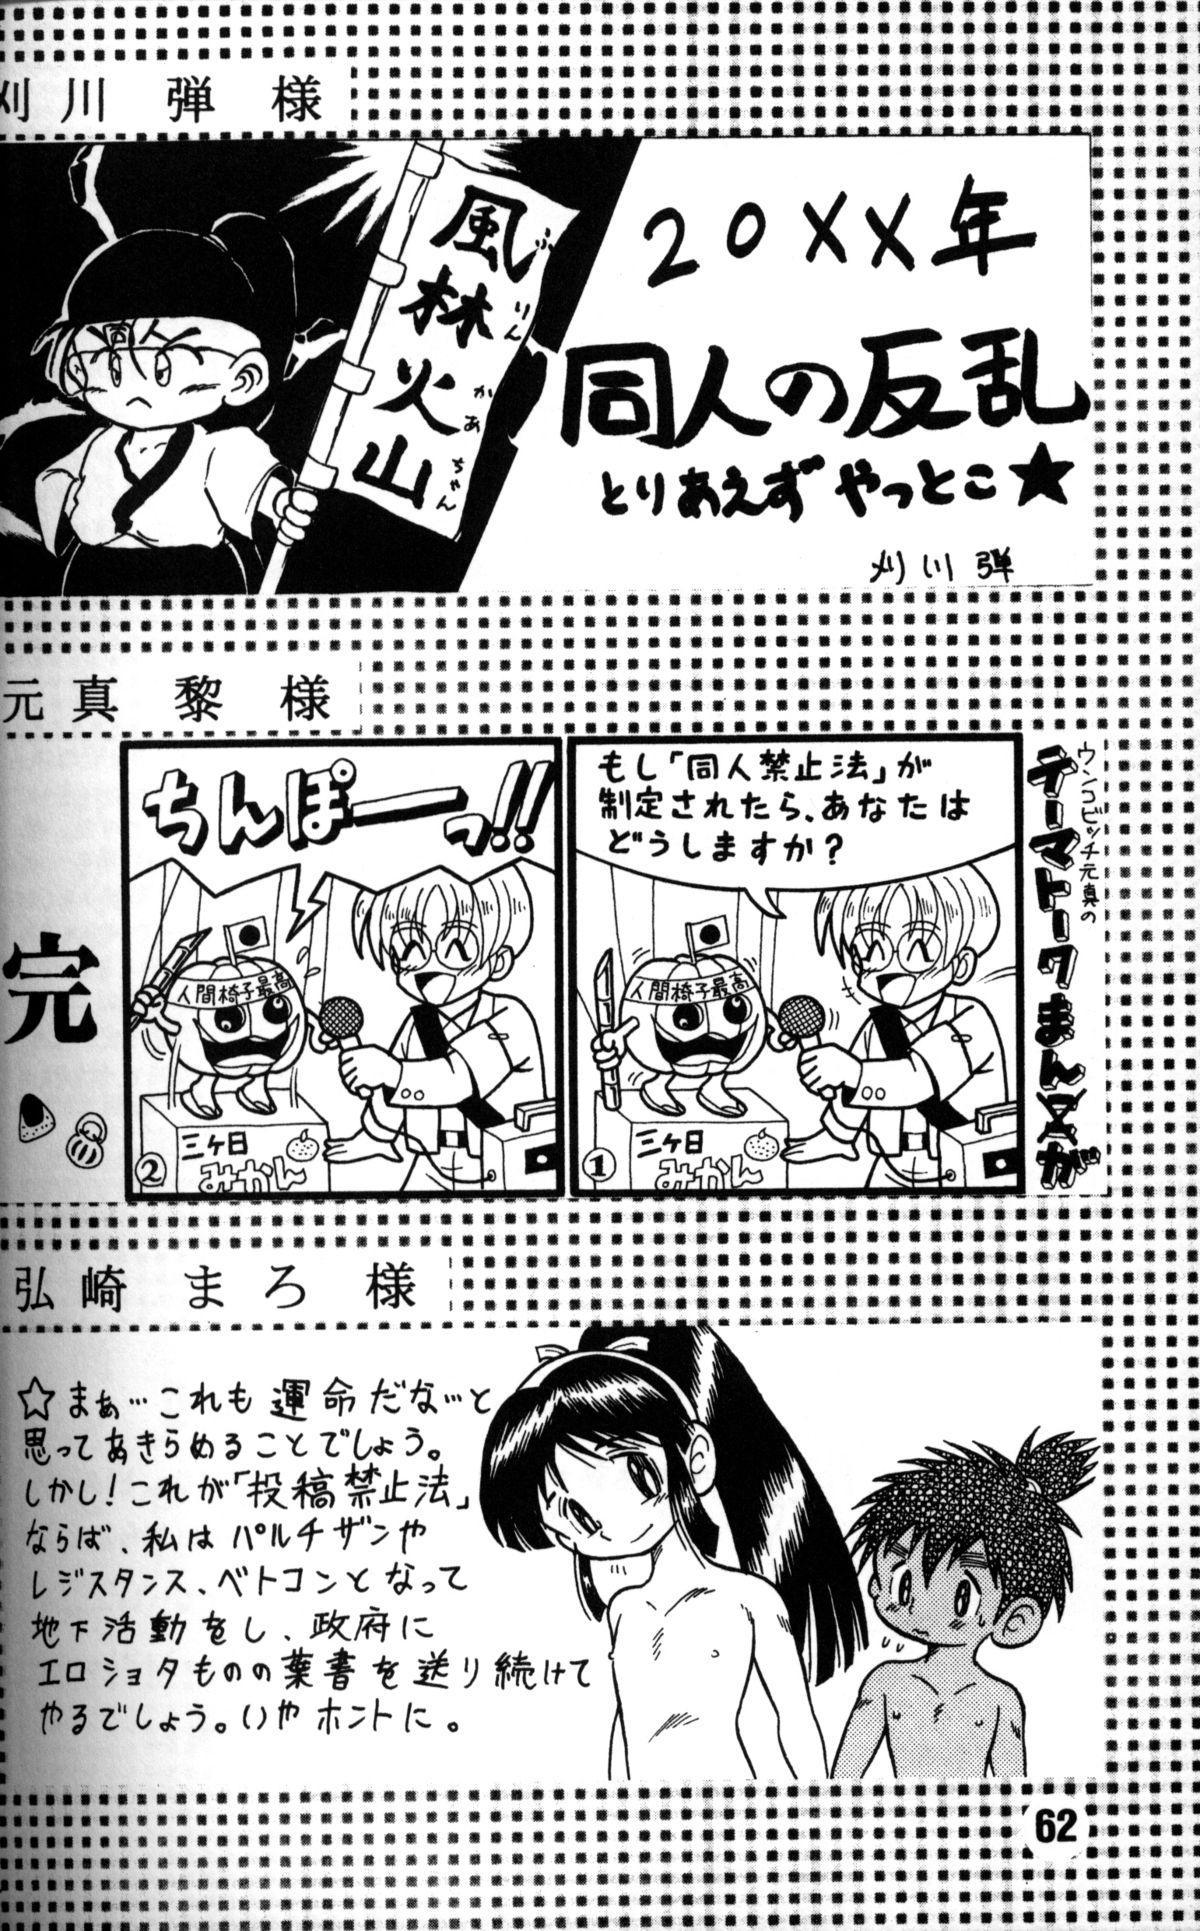 Anthology - Nekketsu Project - Volume 4 'Shounen Vanilla Essence' 60